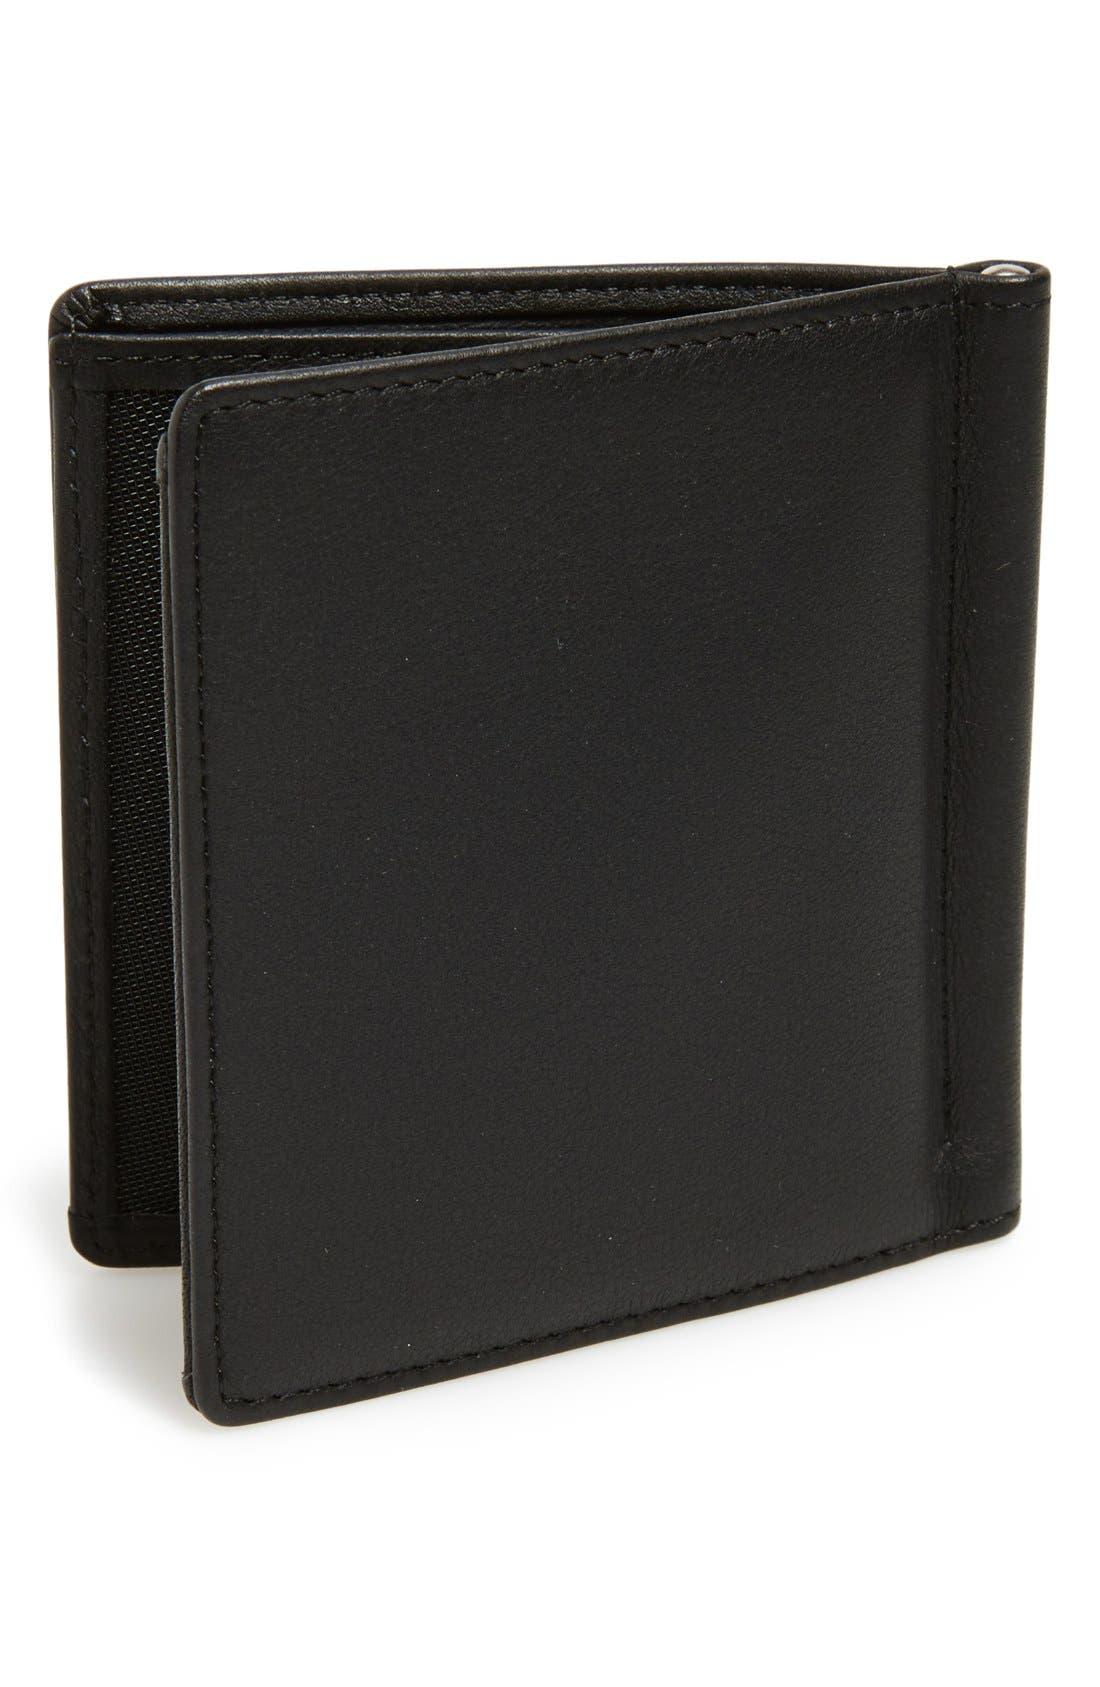 'CL2 2.0' Money Clip Card Holder,                             Alternate thumbnail 2, color,                             001